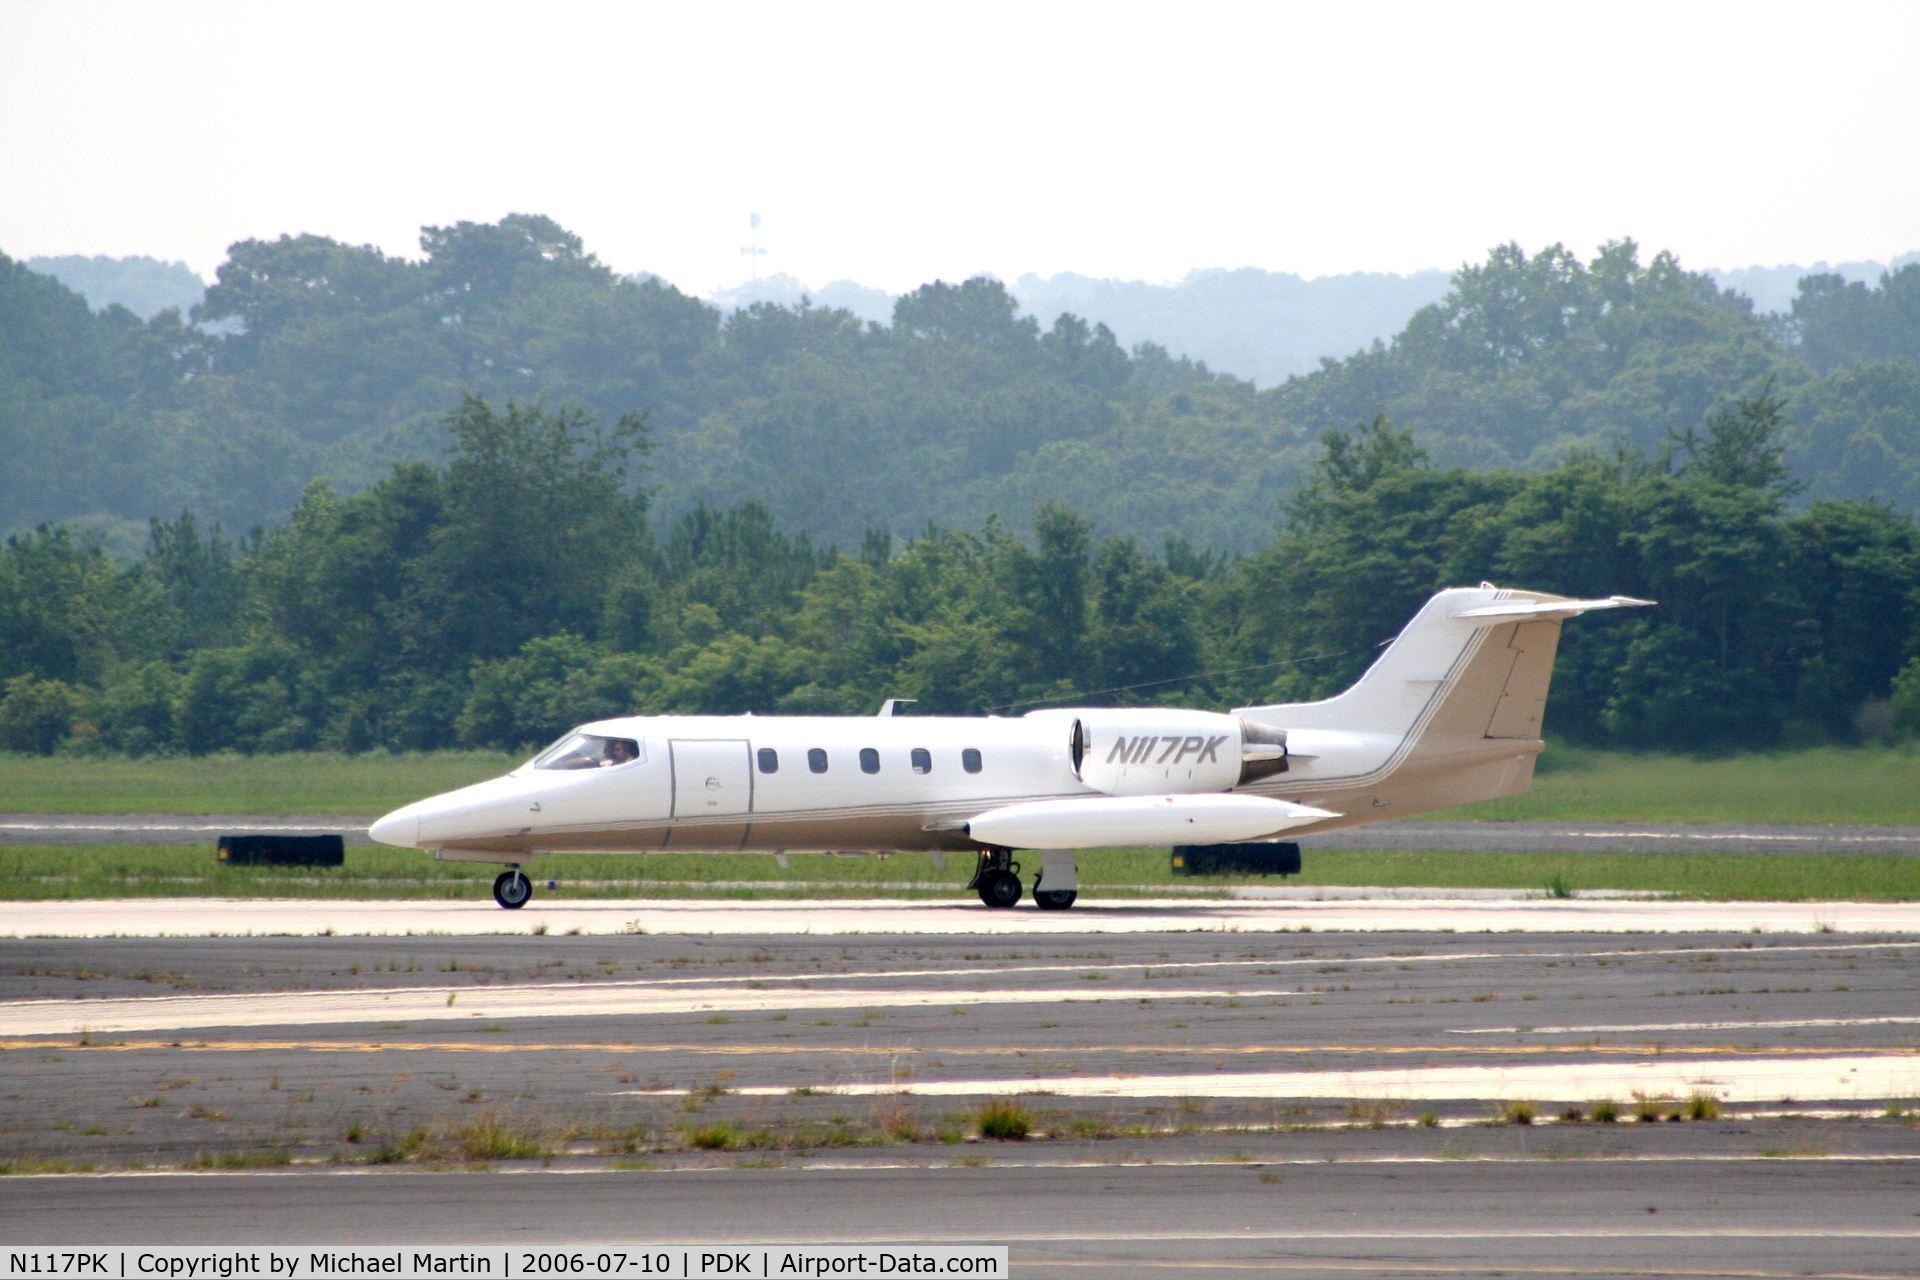 N117PK, Learjet 35A C/N 35A-513, Departing 2L